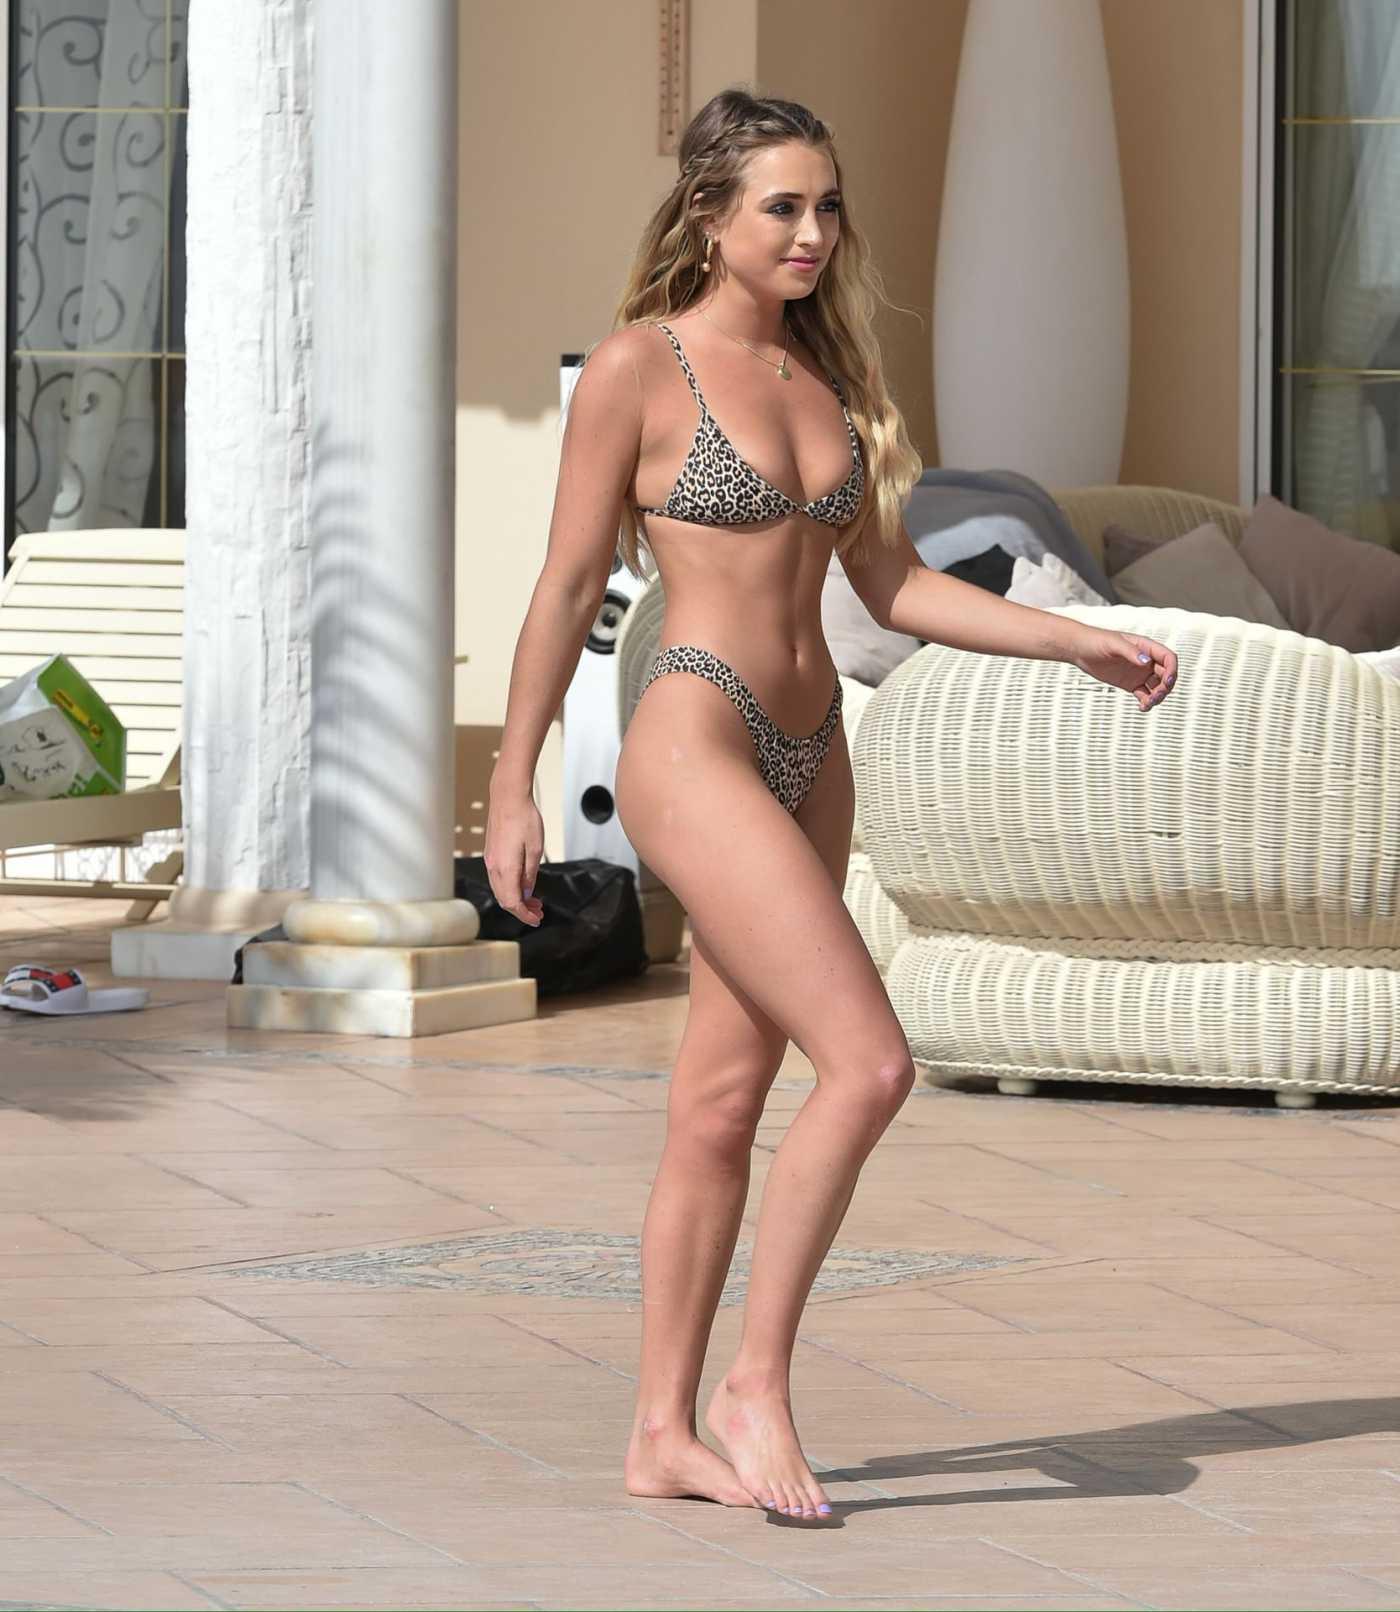 Georgia Harrison in a Leopard Print Bikini by the Pool at Her Hotel in Tenerife 03/02/2020